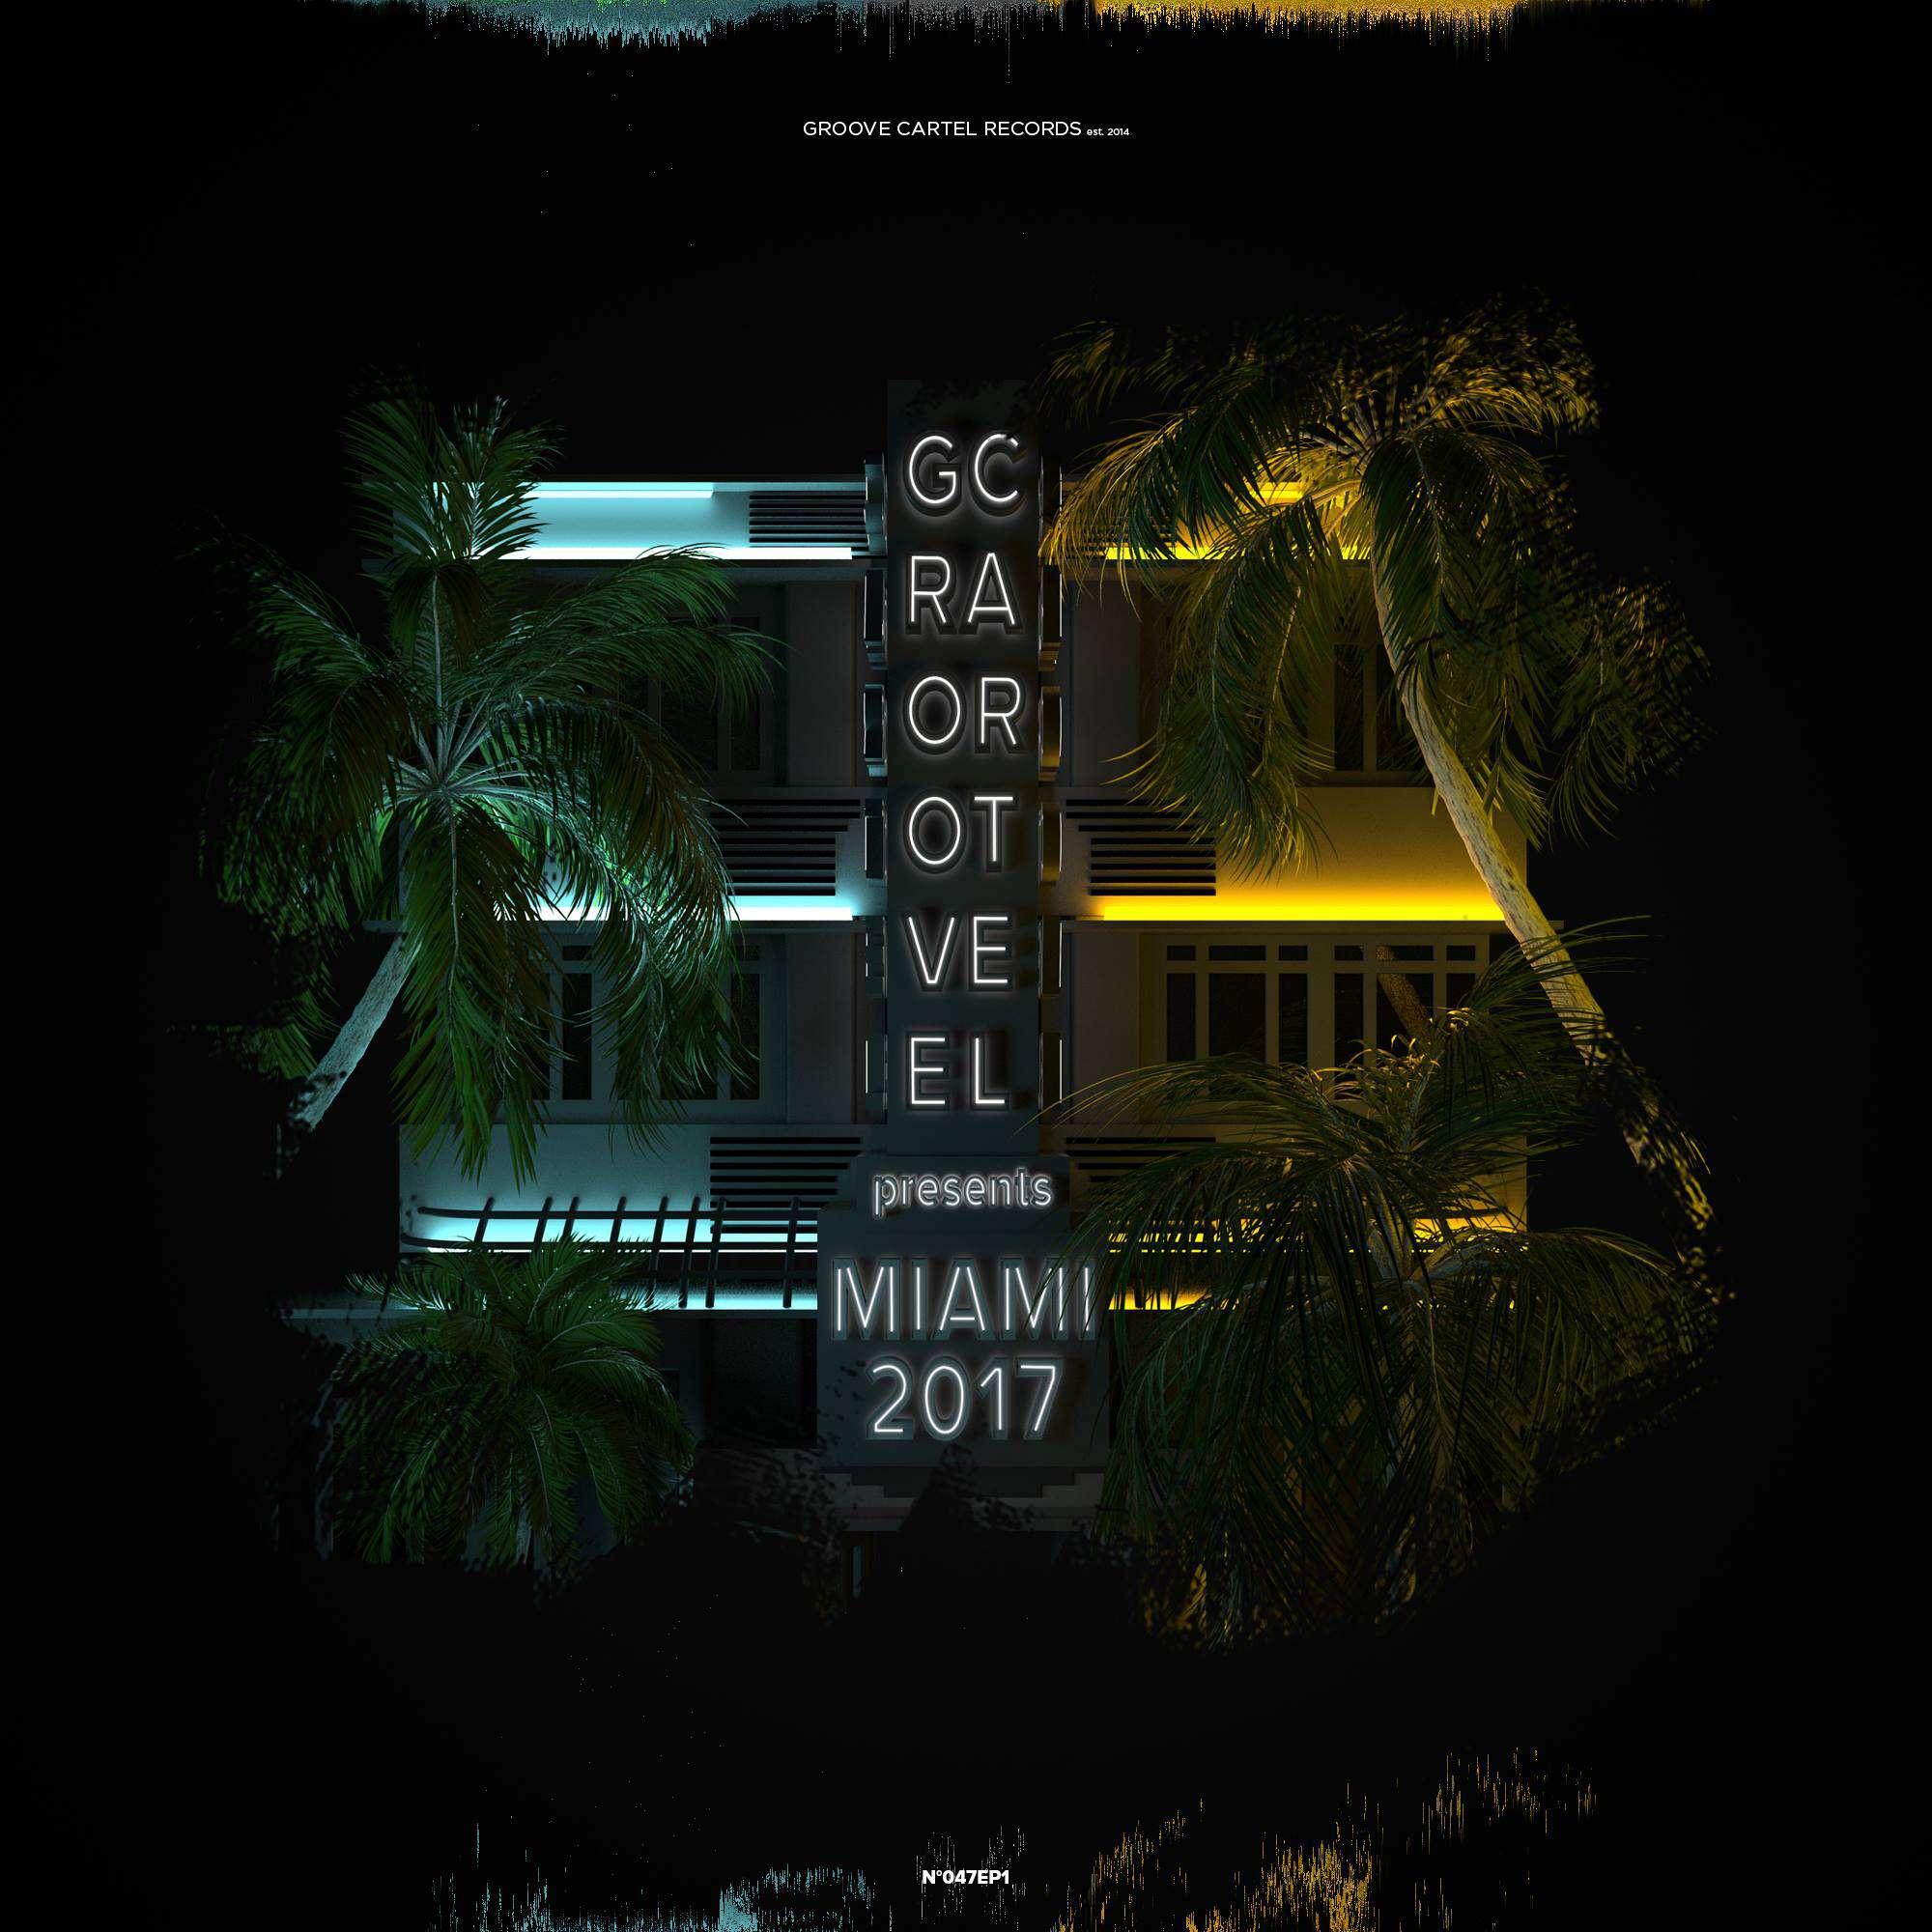 Groove Cartel presents Miami 2017 [Free Download]